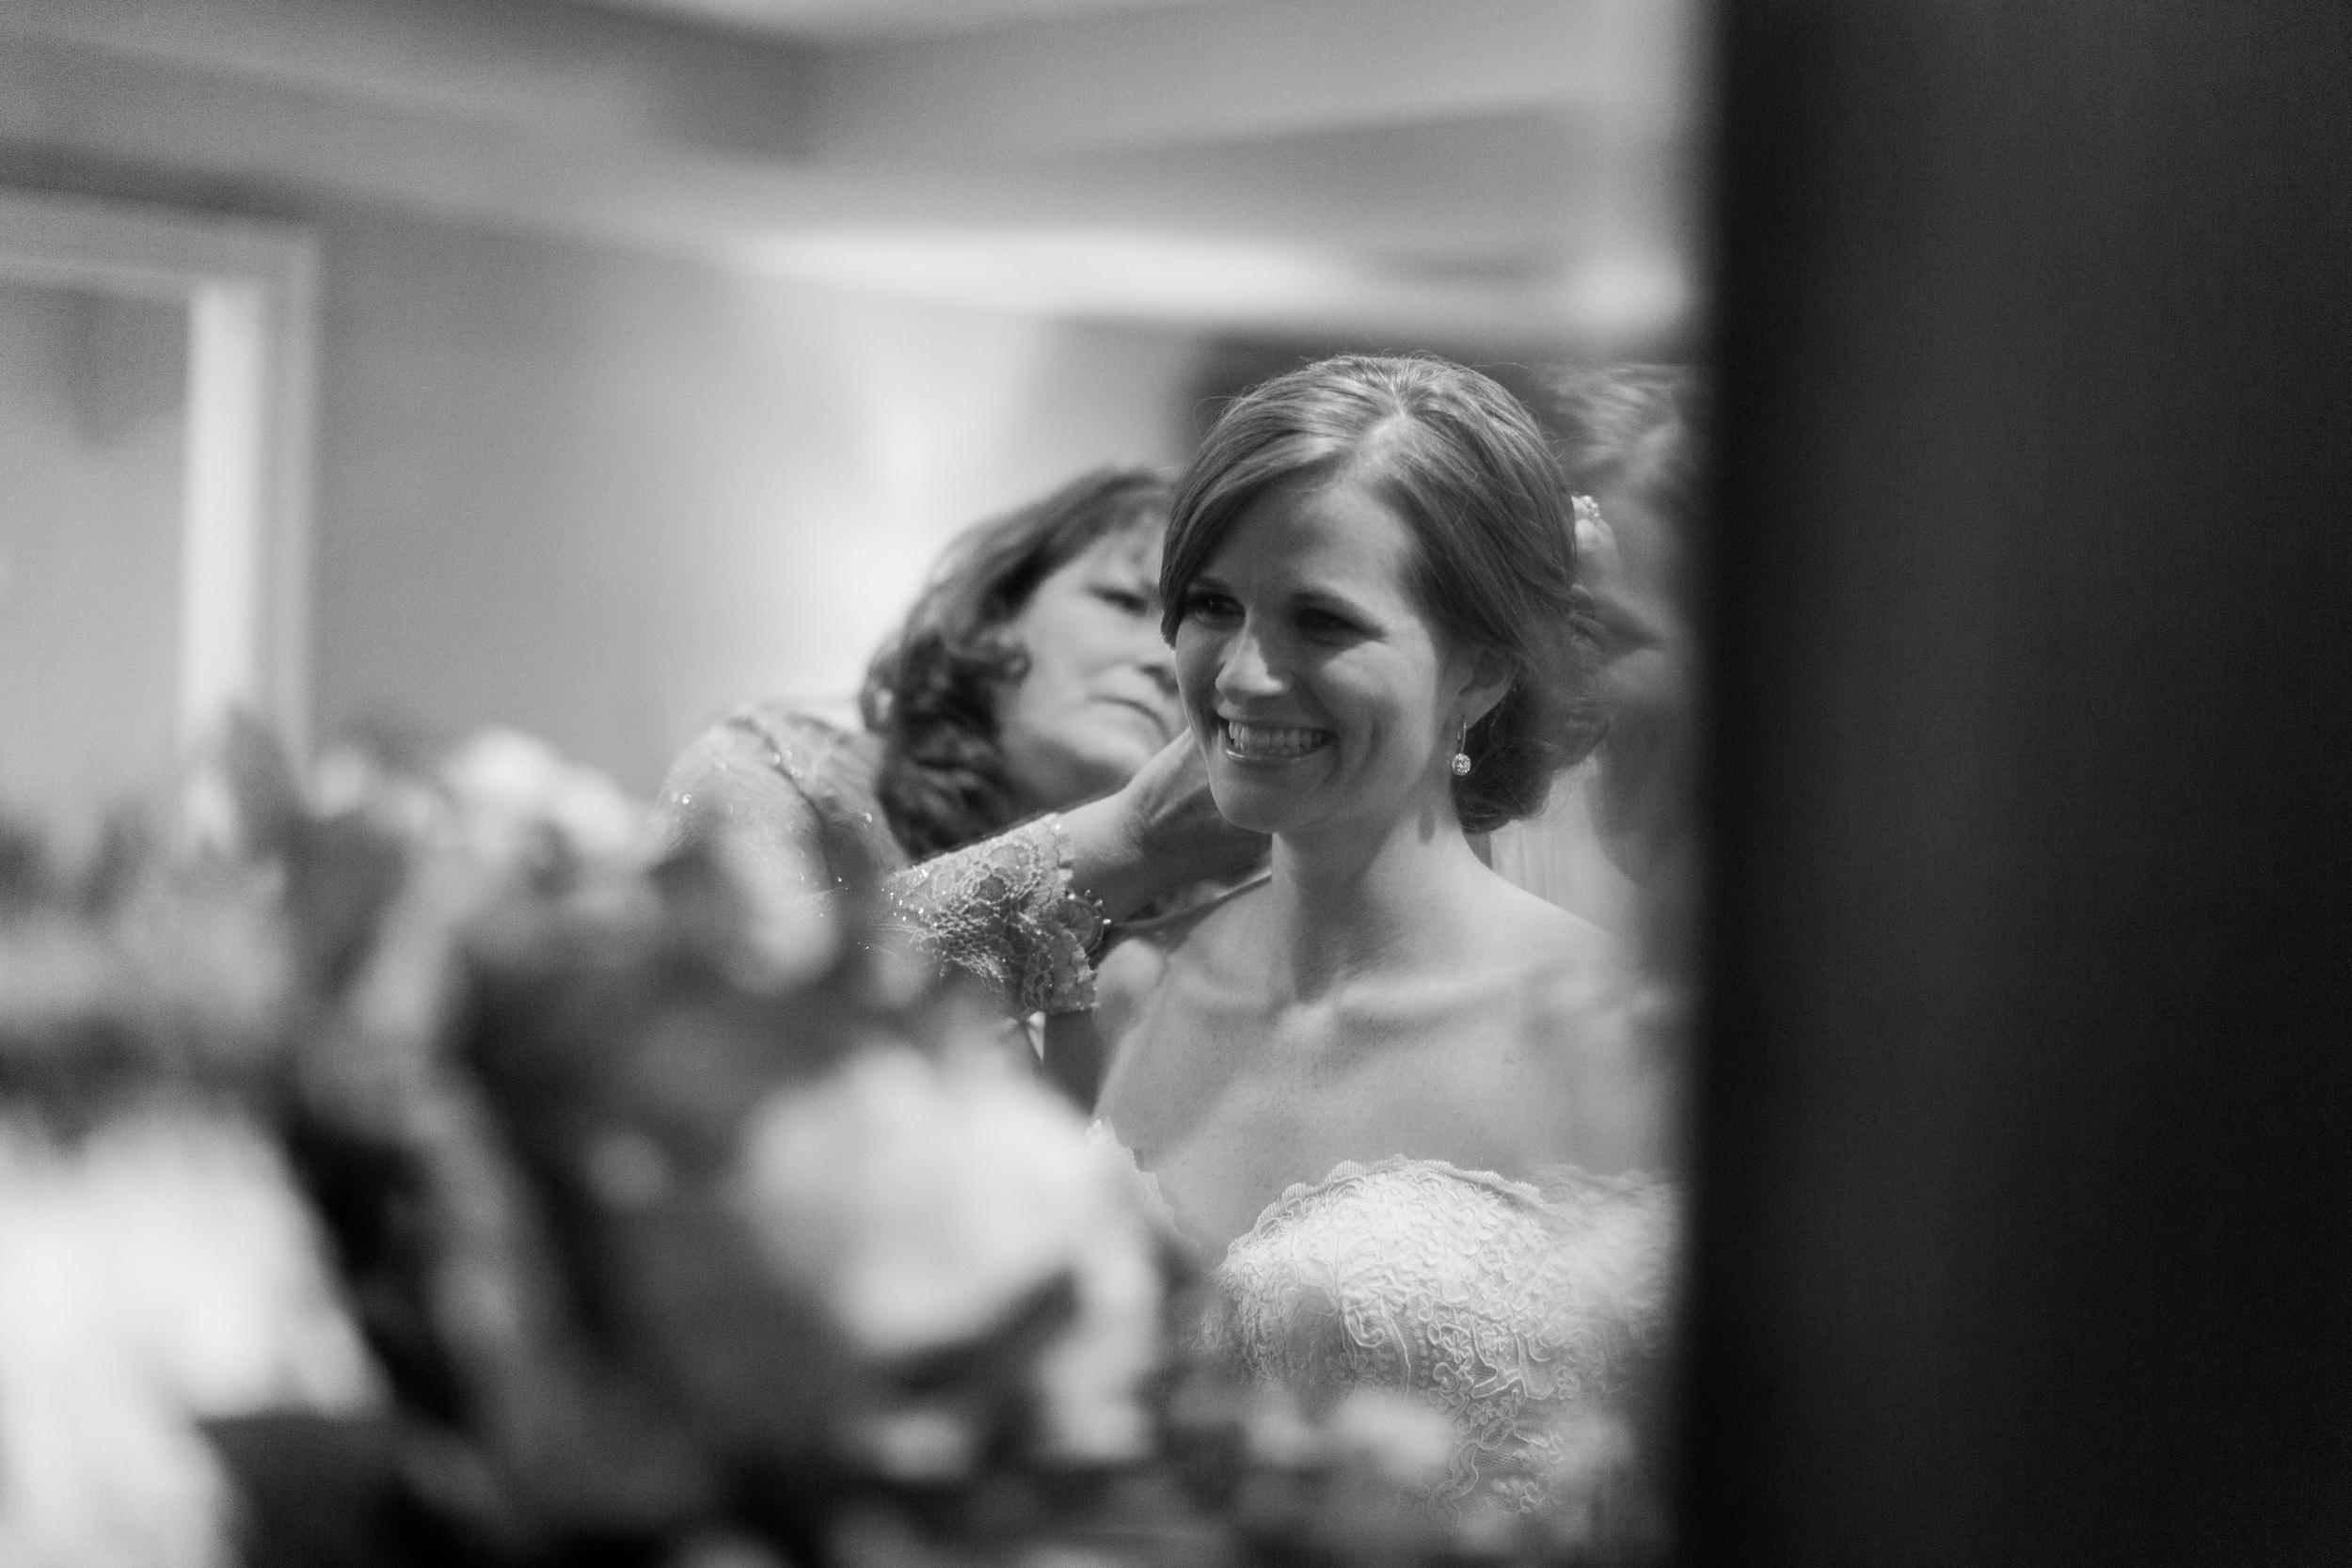 Brewbaker-Wedding-Montgomery-Alabama-Nick-Drollette-105.jpg